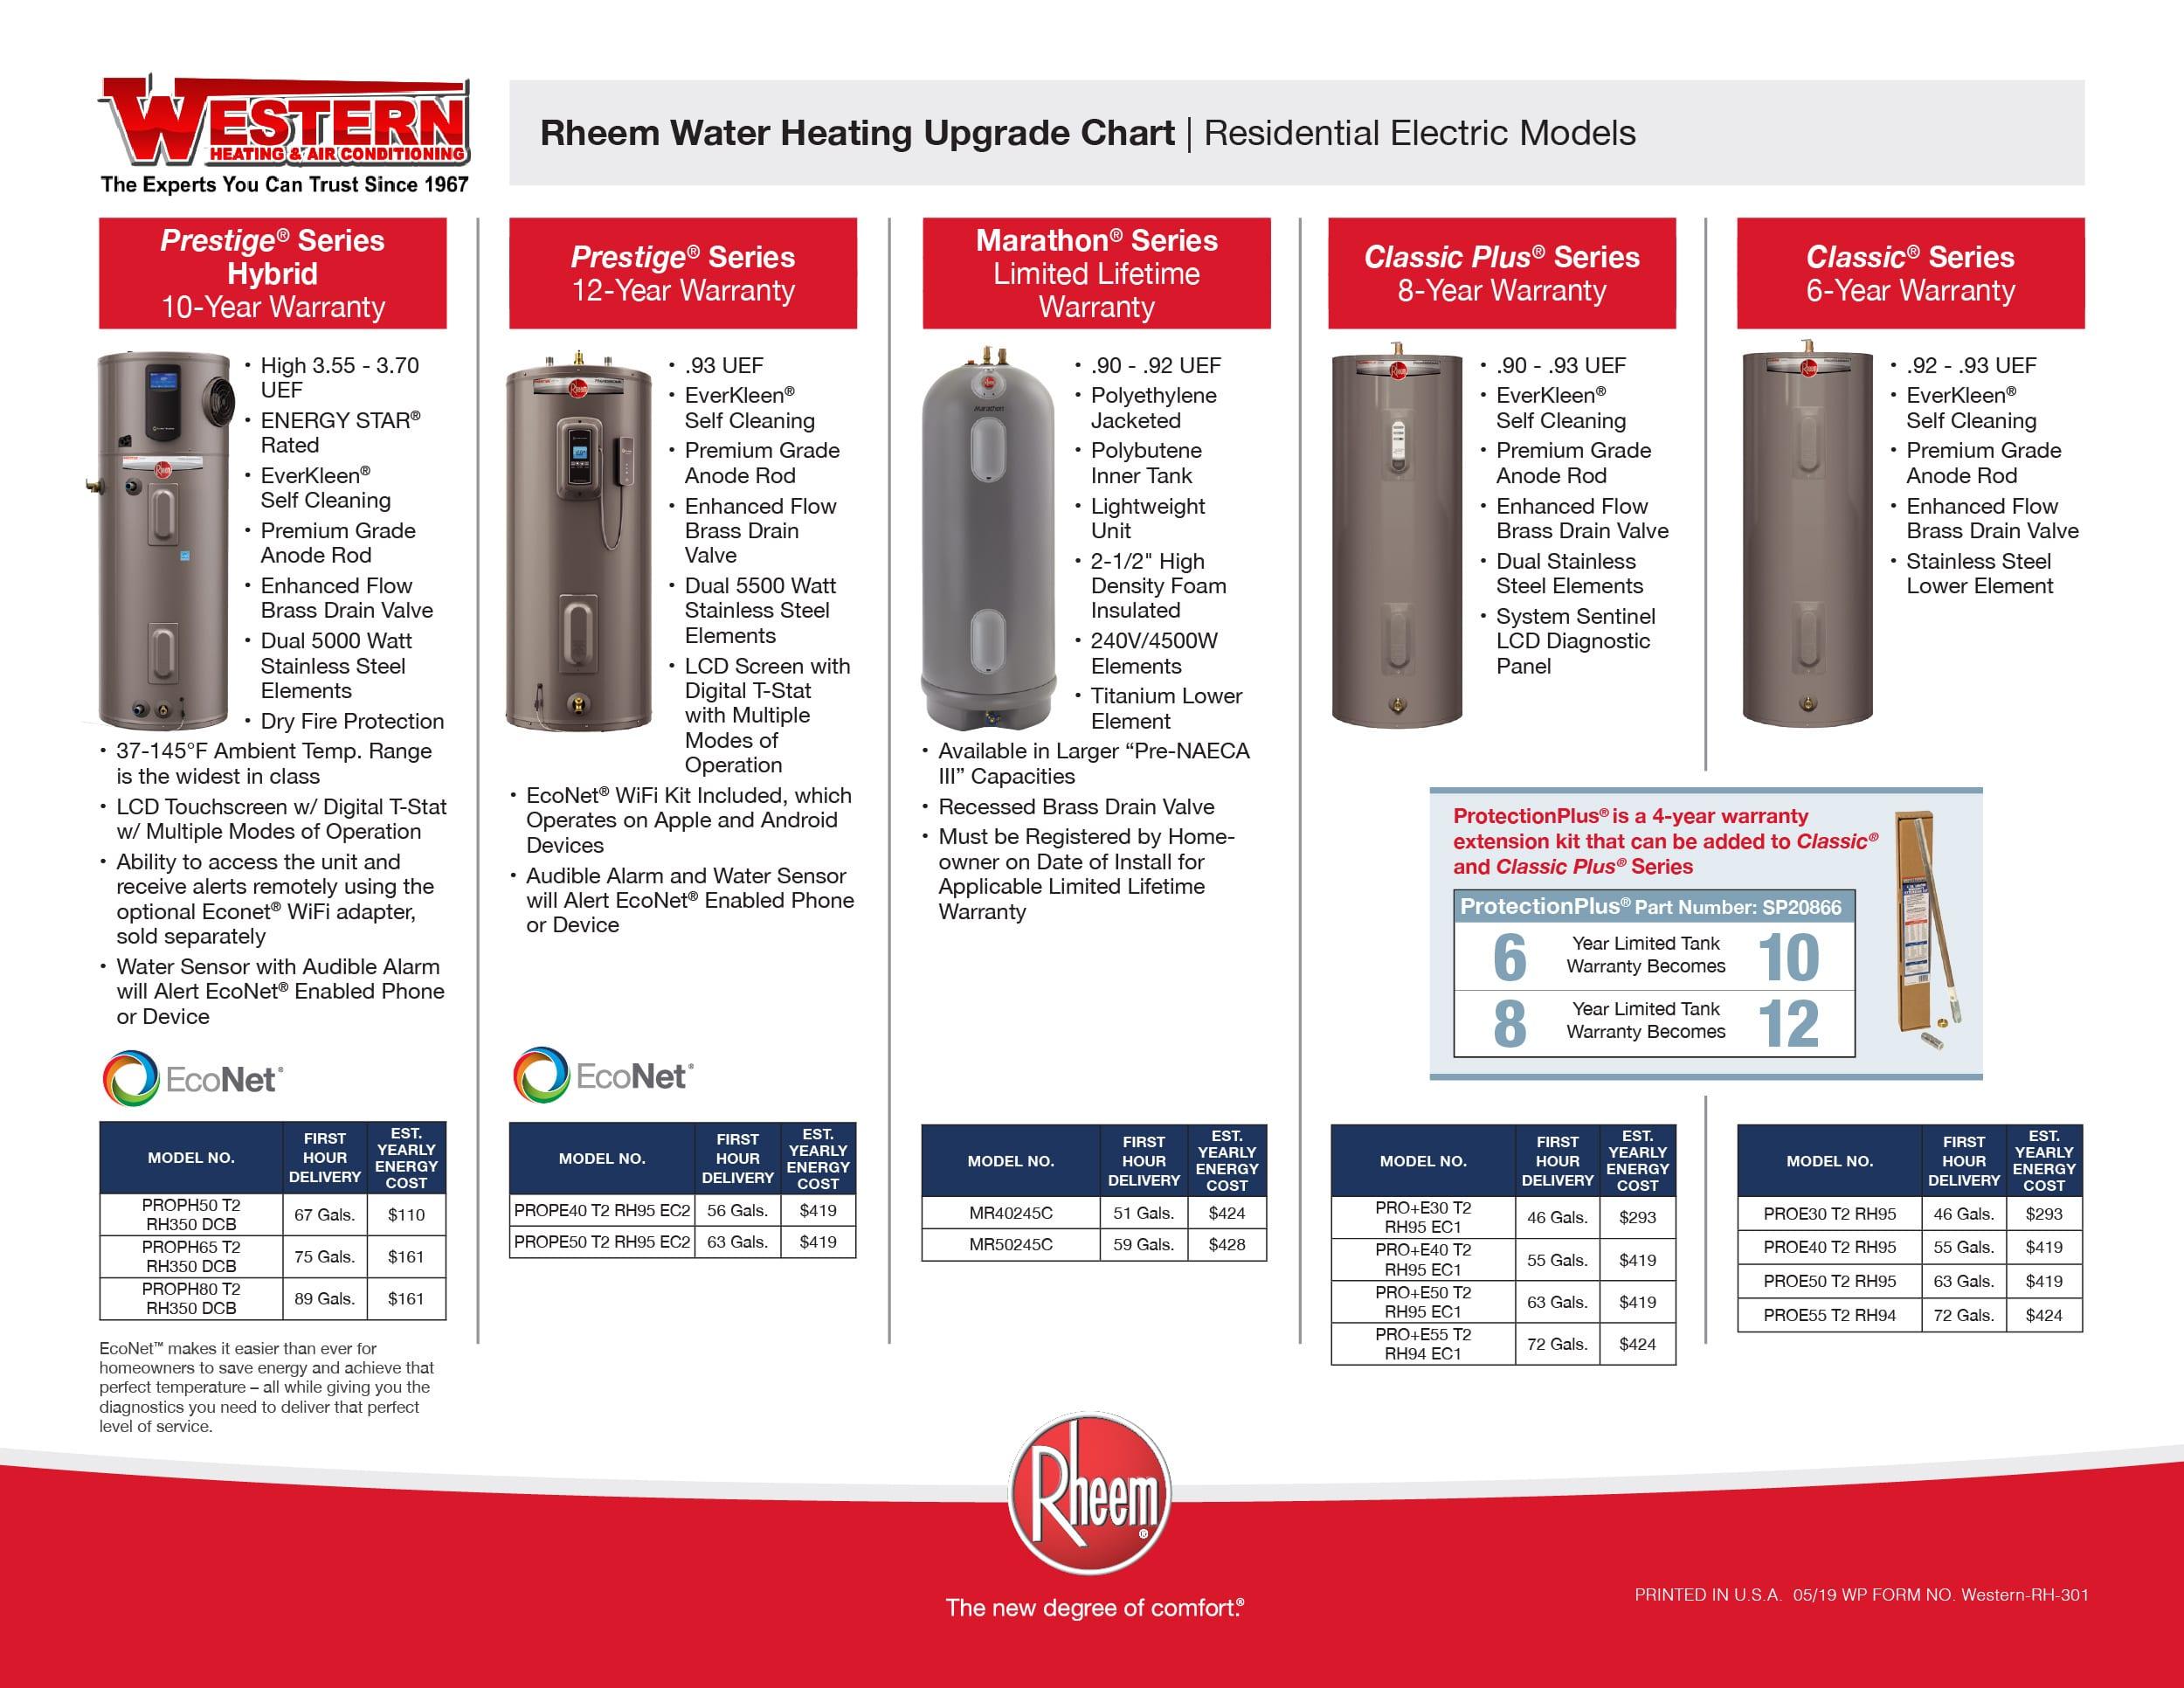 Rheem Water Heating Upgrade Chart Page 2